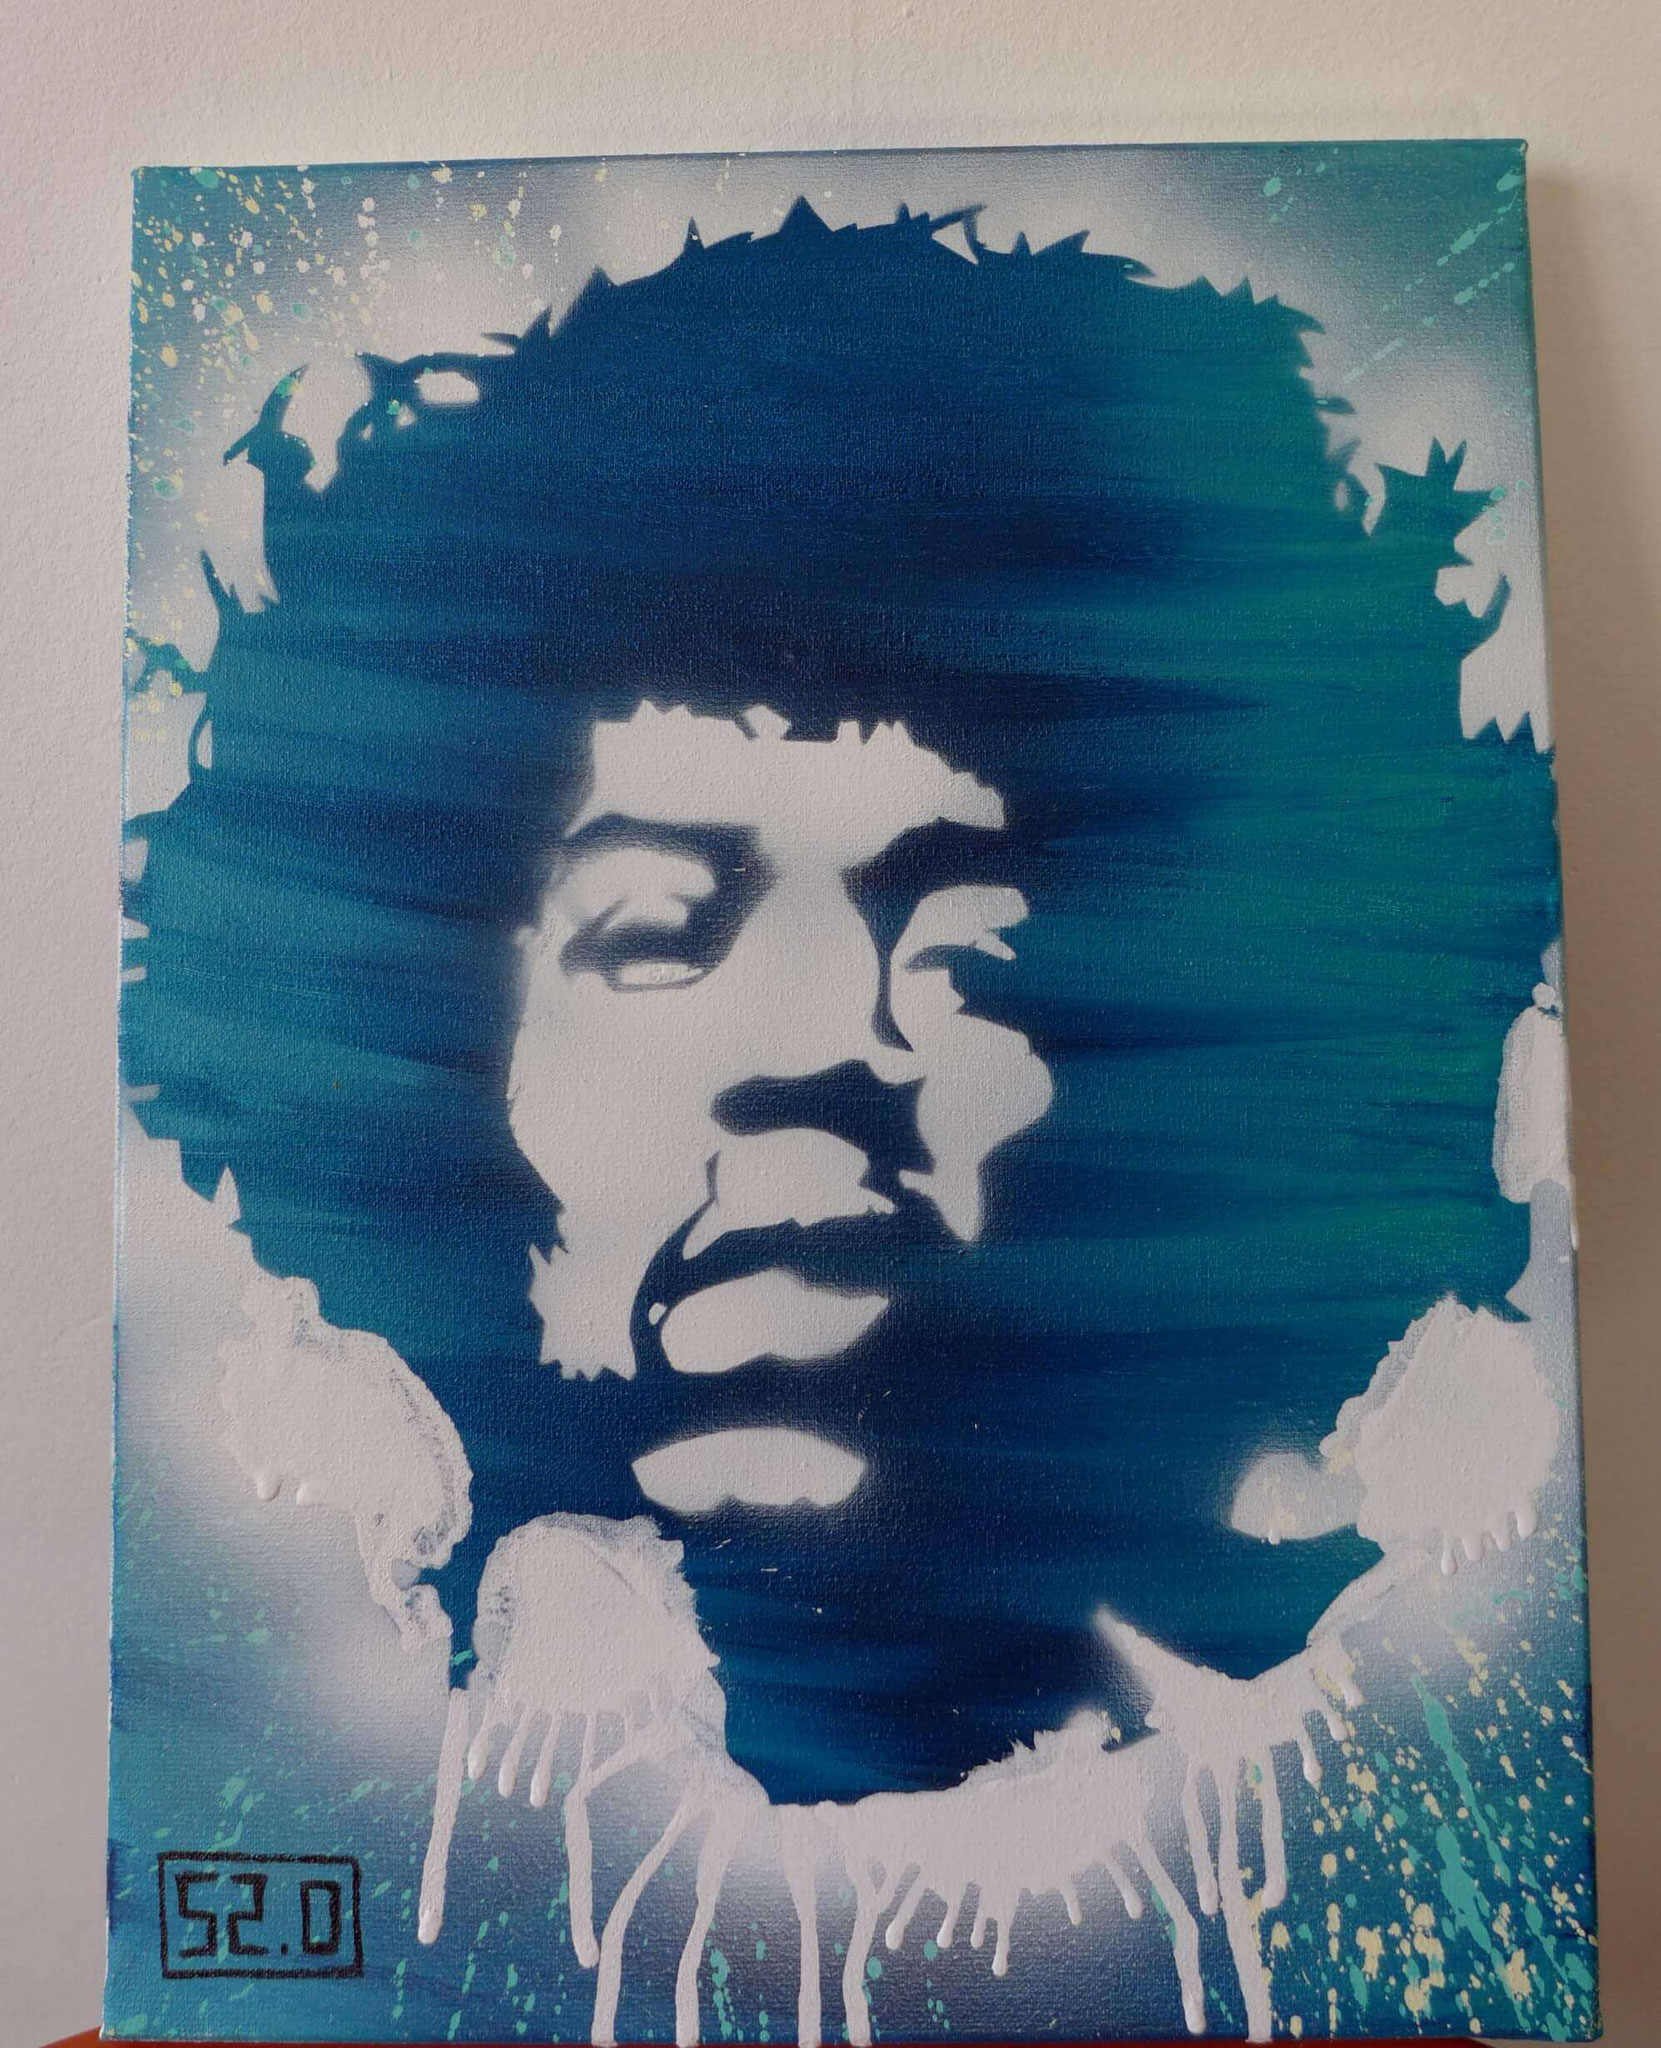 Hendrix Jimi street art pochoir par Slave 2.0